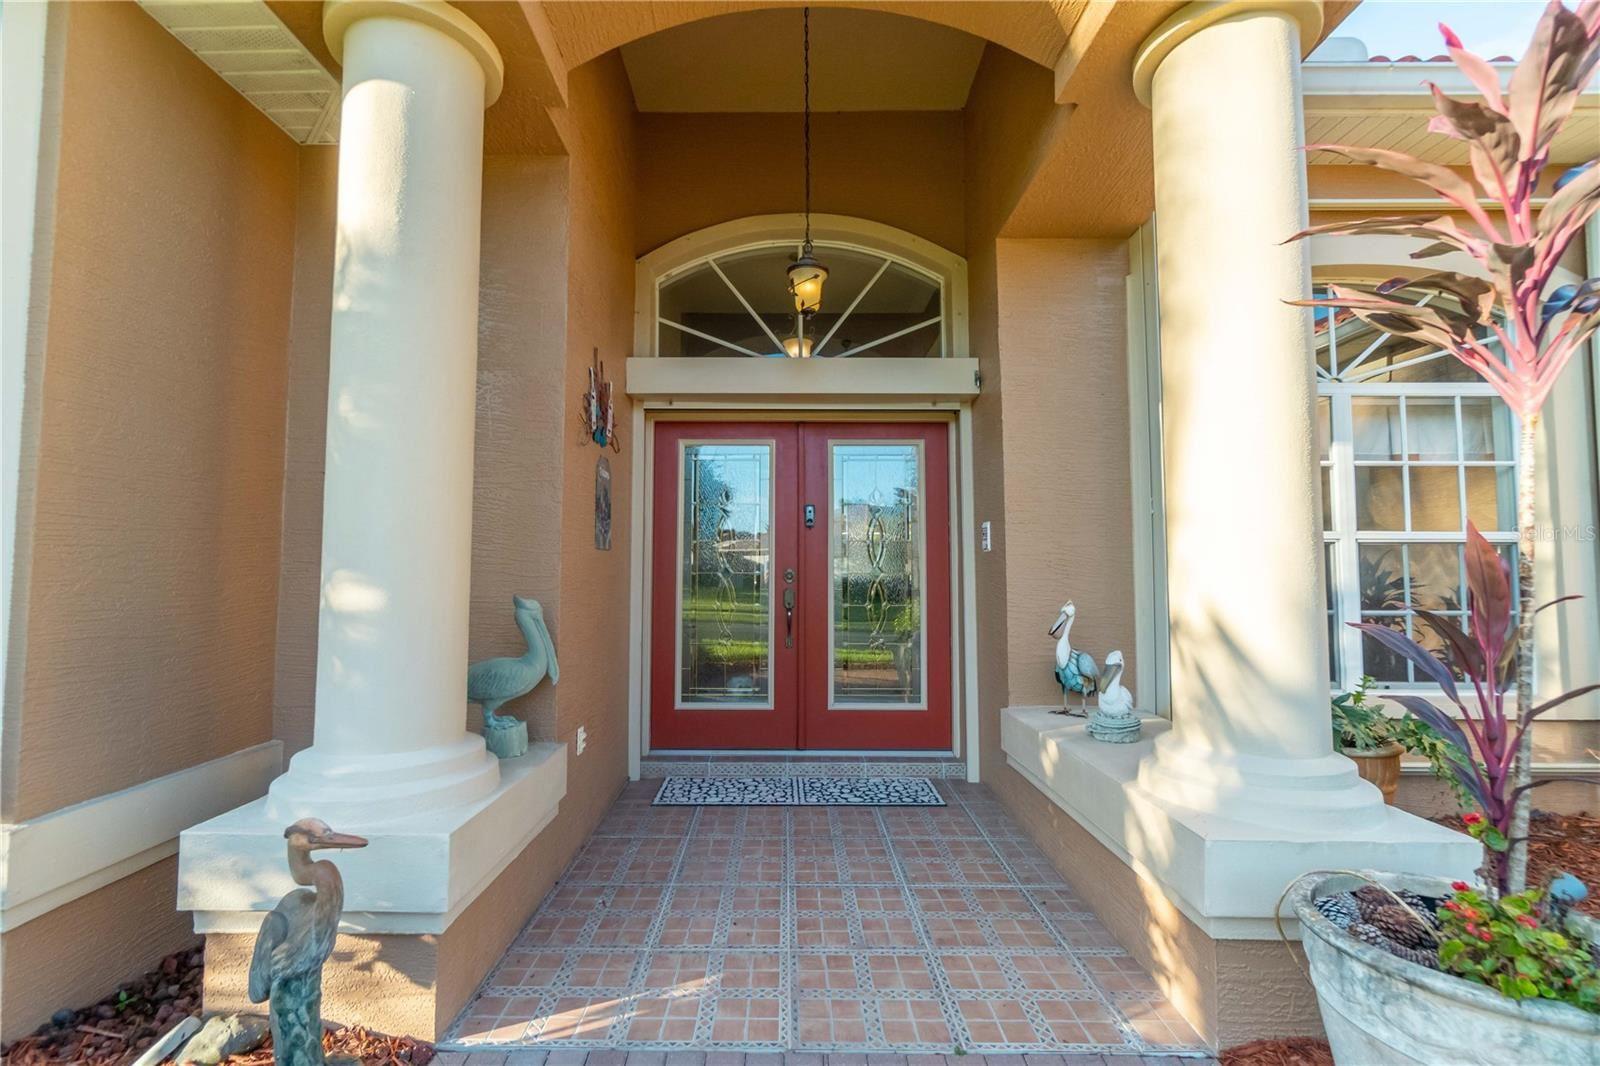 Photo of 4959 WILD DAISY LANE, VENICE, FL 34293 (MLS # N6117710)